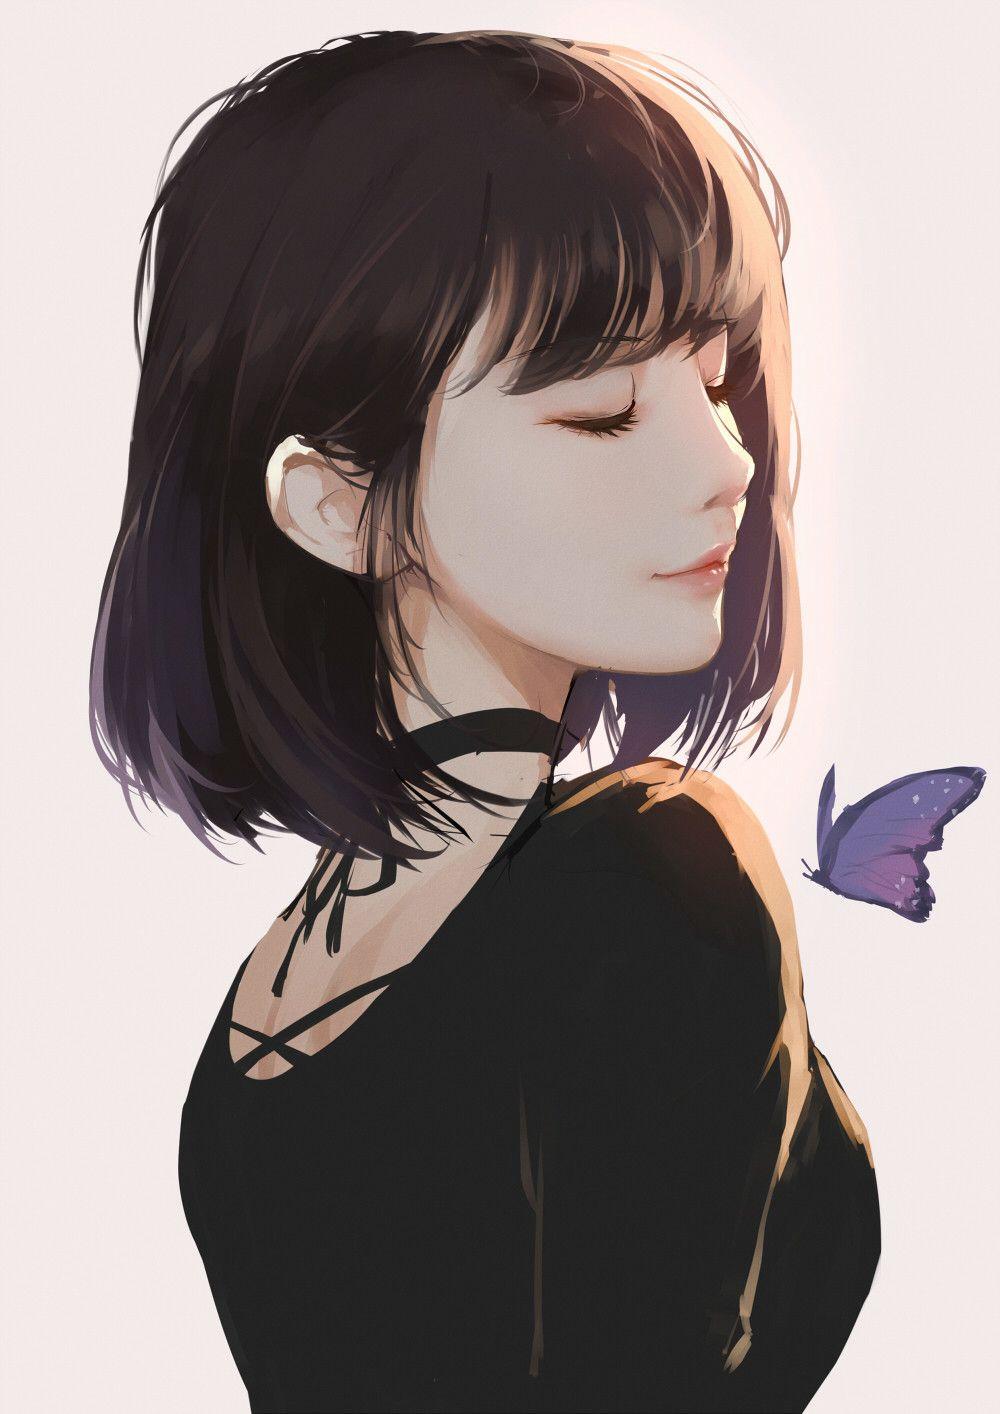 Pin By Lucky Blue57 On Aesthetic In 2020 Anime Art Girl Anime